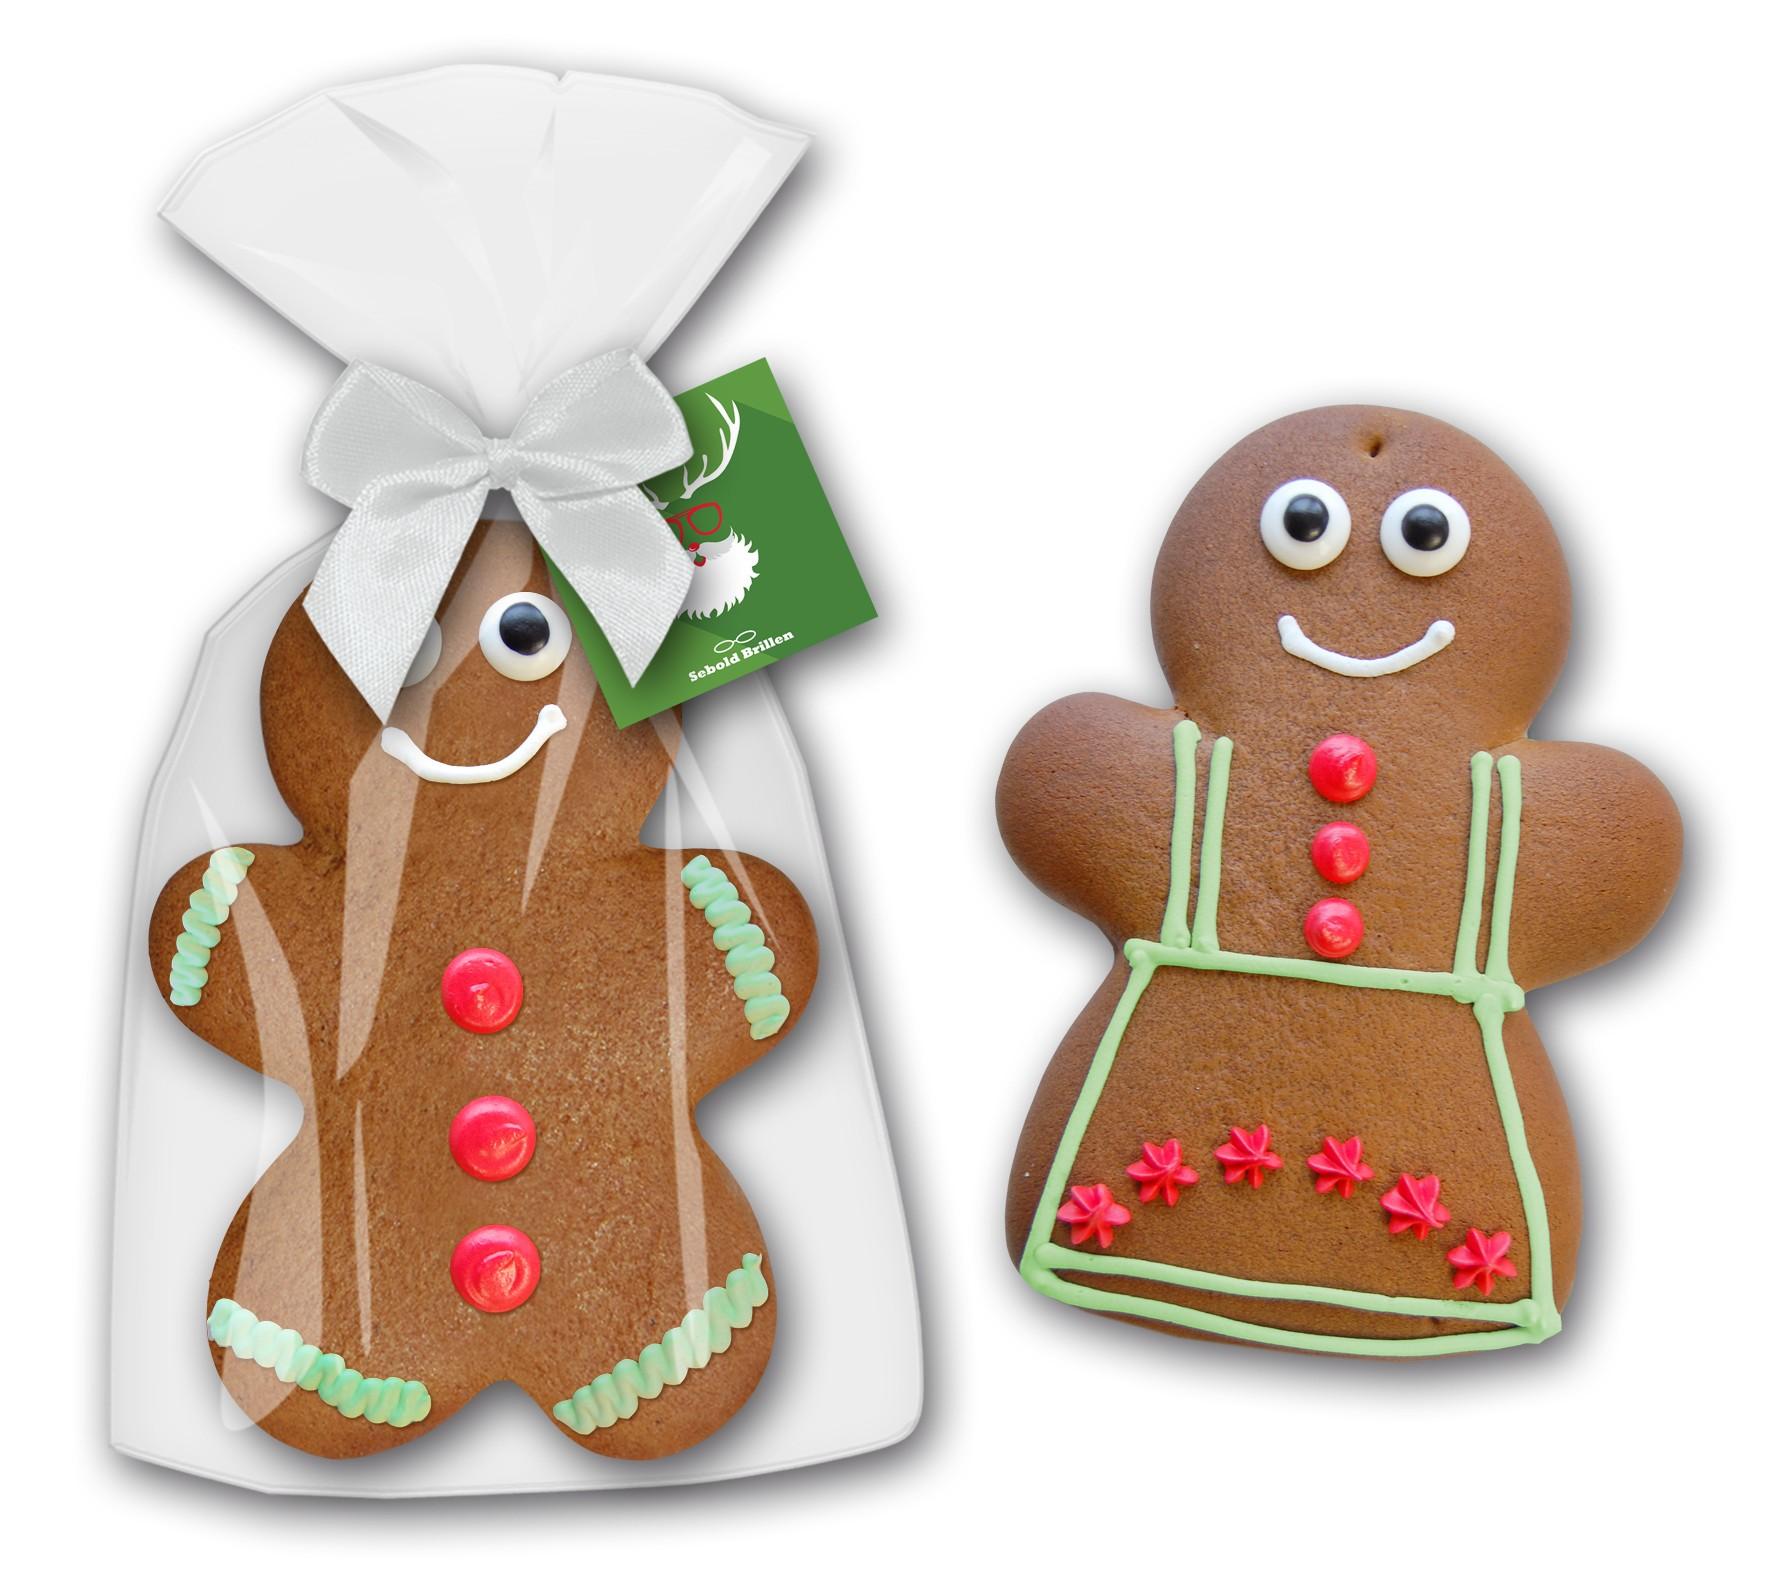 Lebkuchenmann oder Frau groß